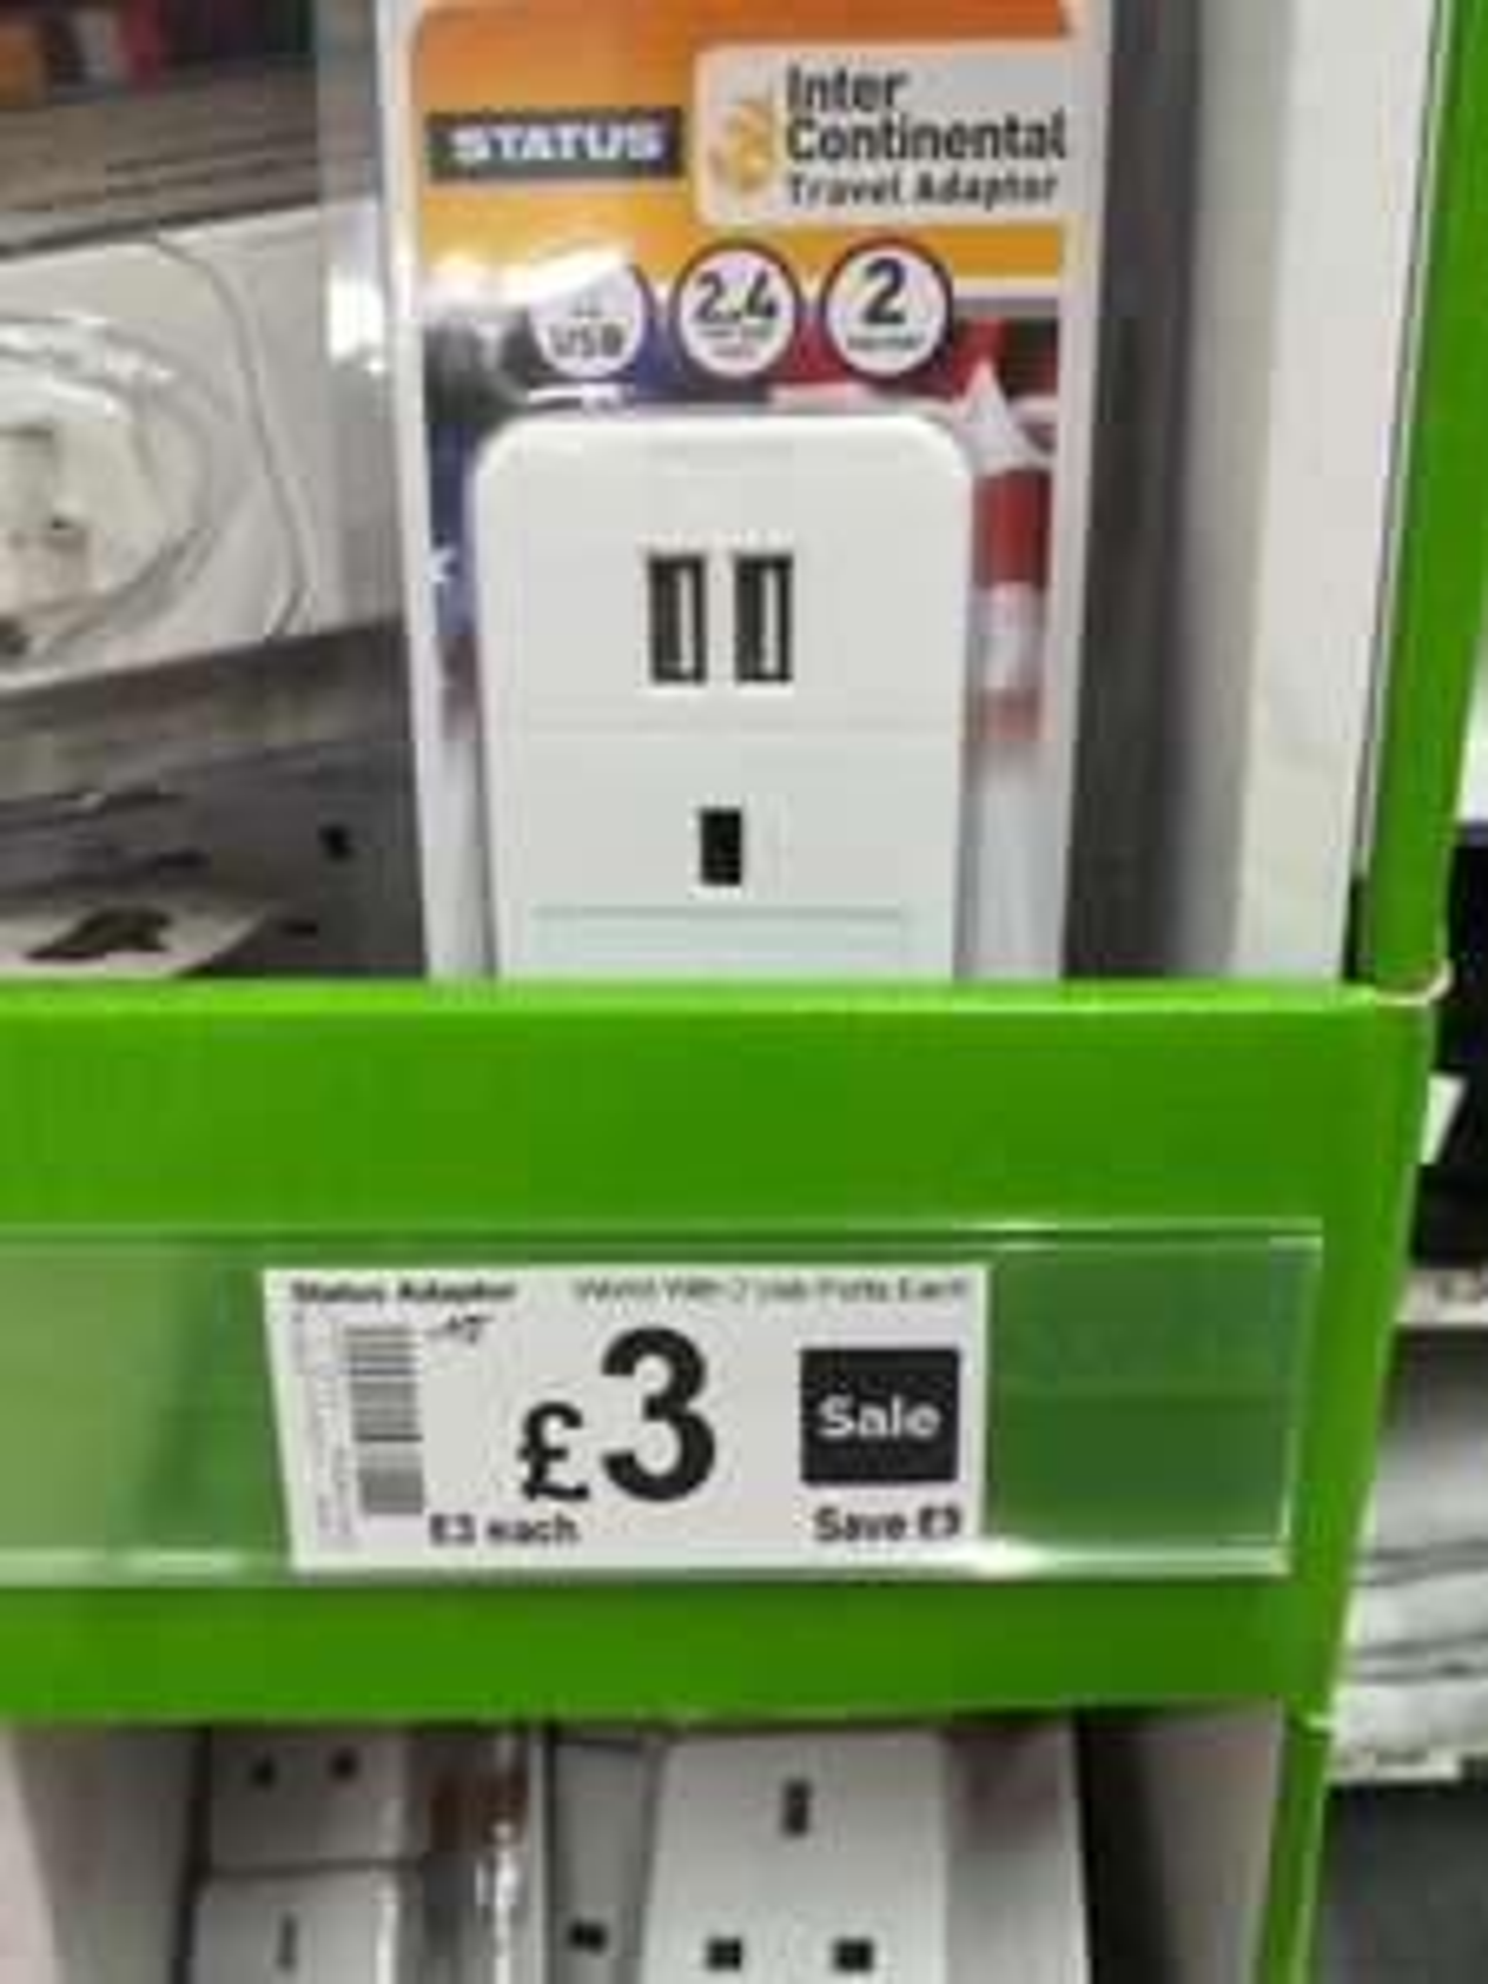 120V Intercontinental Travel Adaptor inc 2 USB Ports £3 instore @ Asda